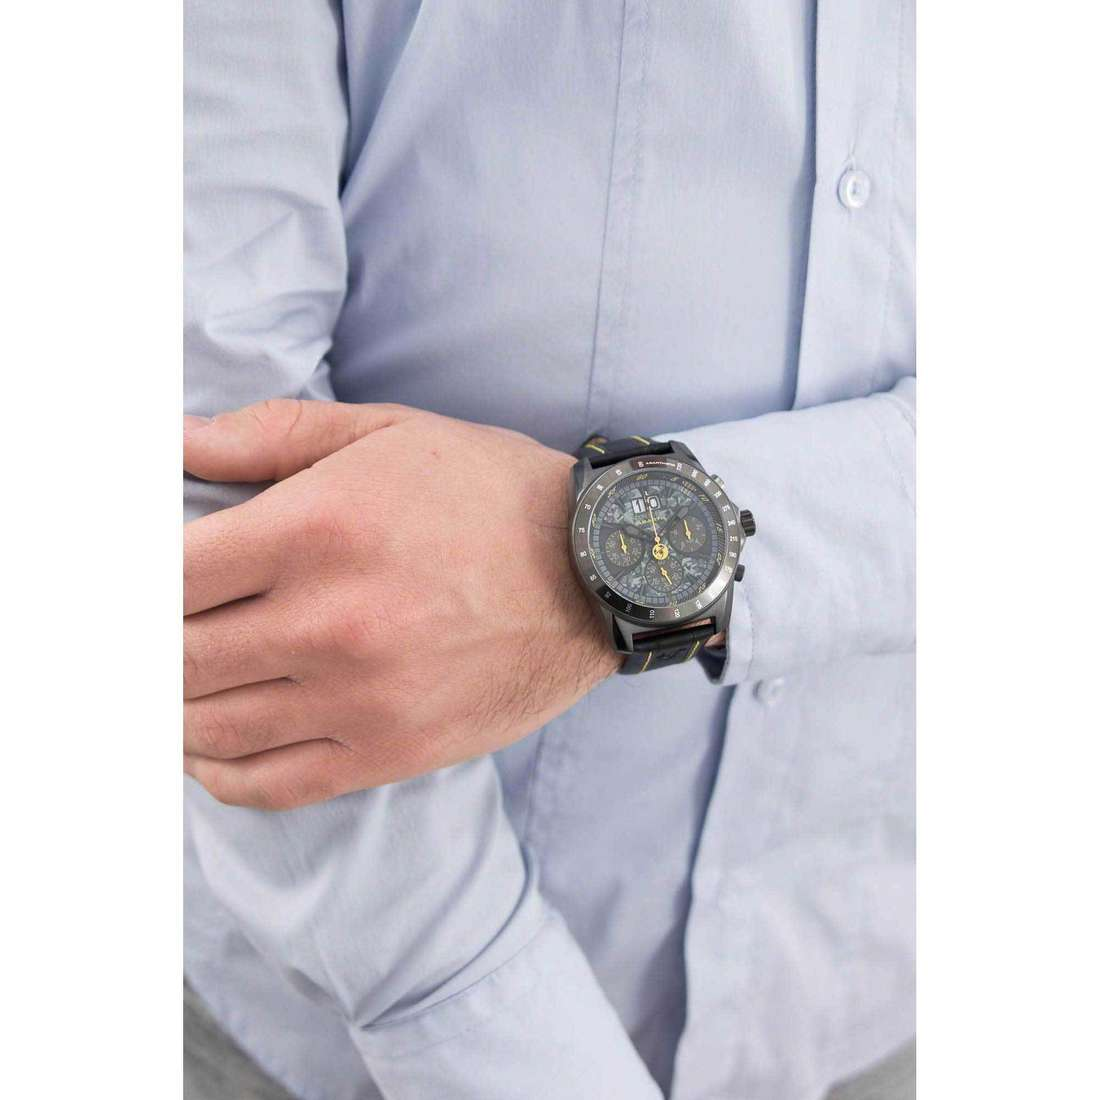 Breil cronografi Abarth uomo TW1362 indosso